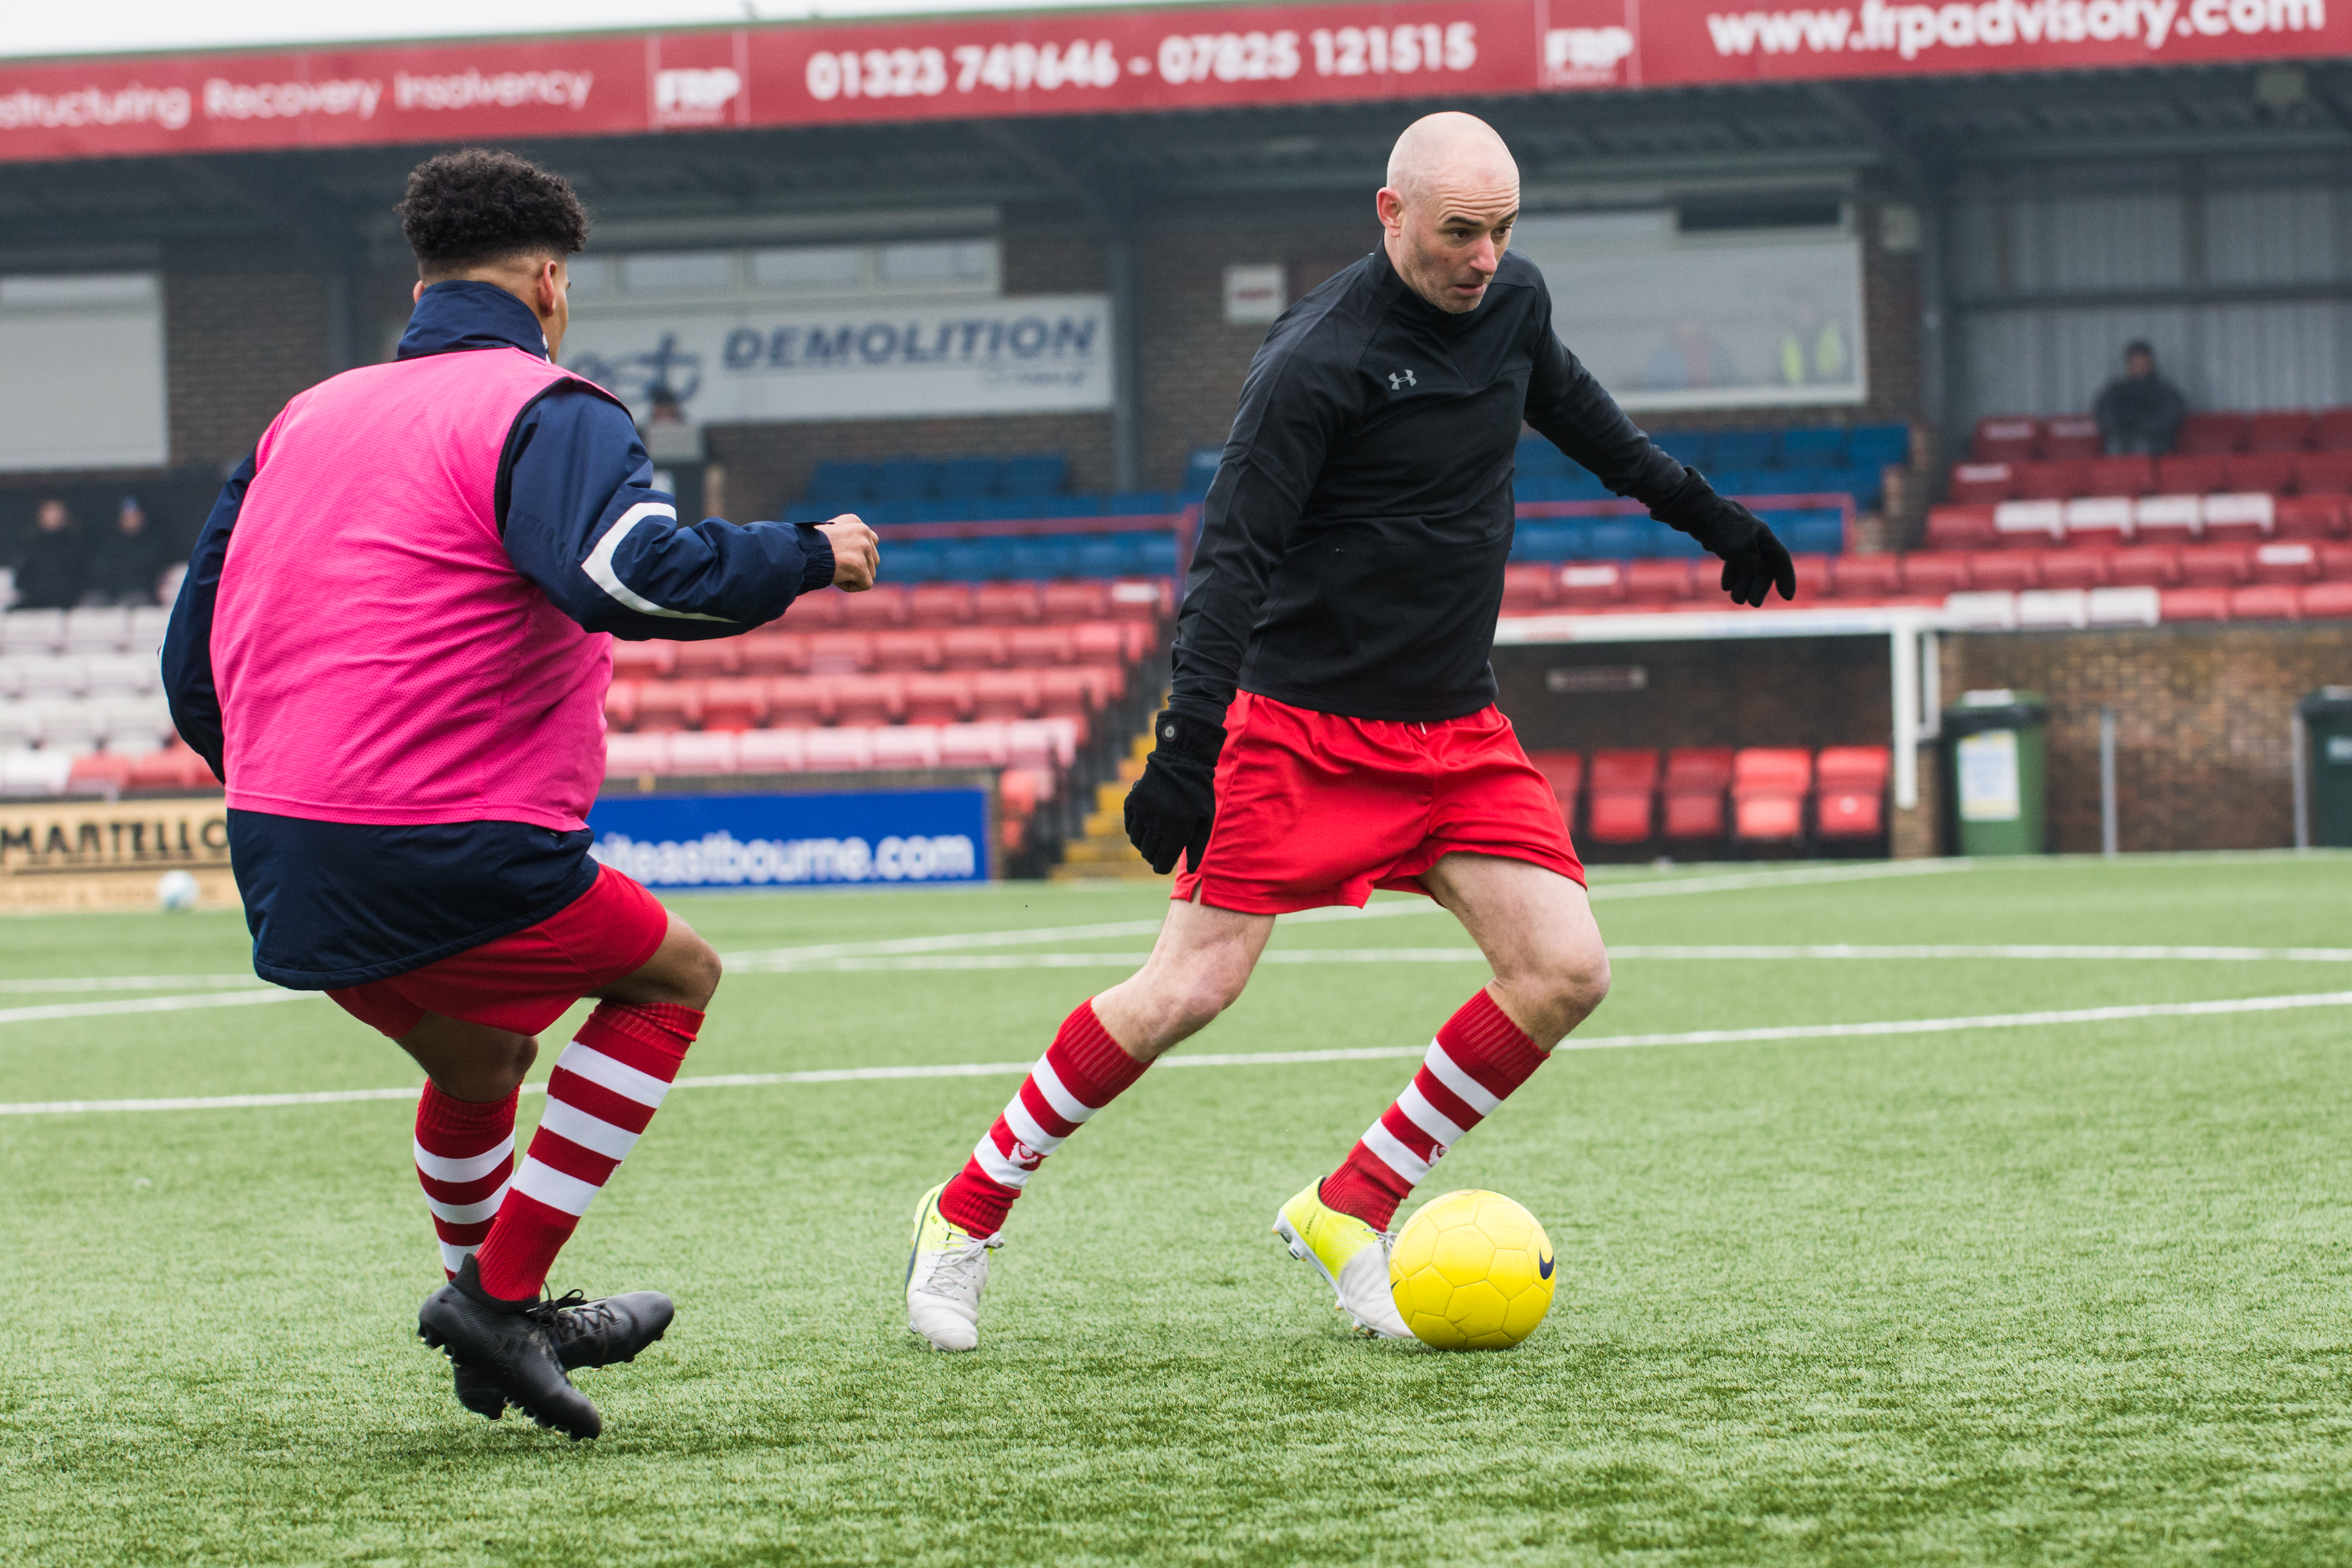 DAVID_JEFFERY Langney Wanderers FC vs Bexhill United FC 03.03.18 23